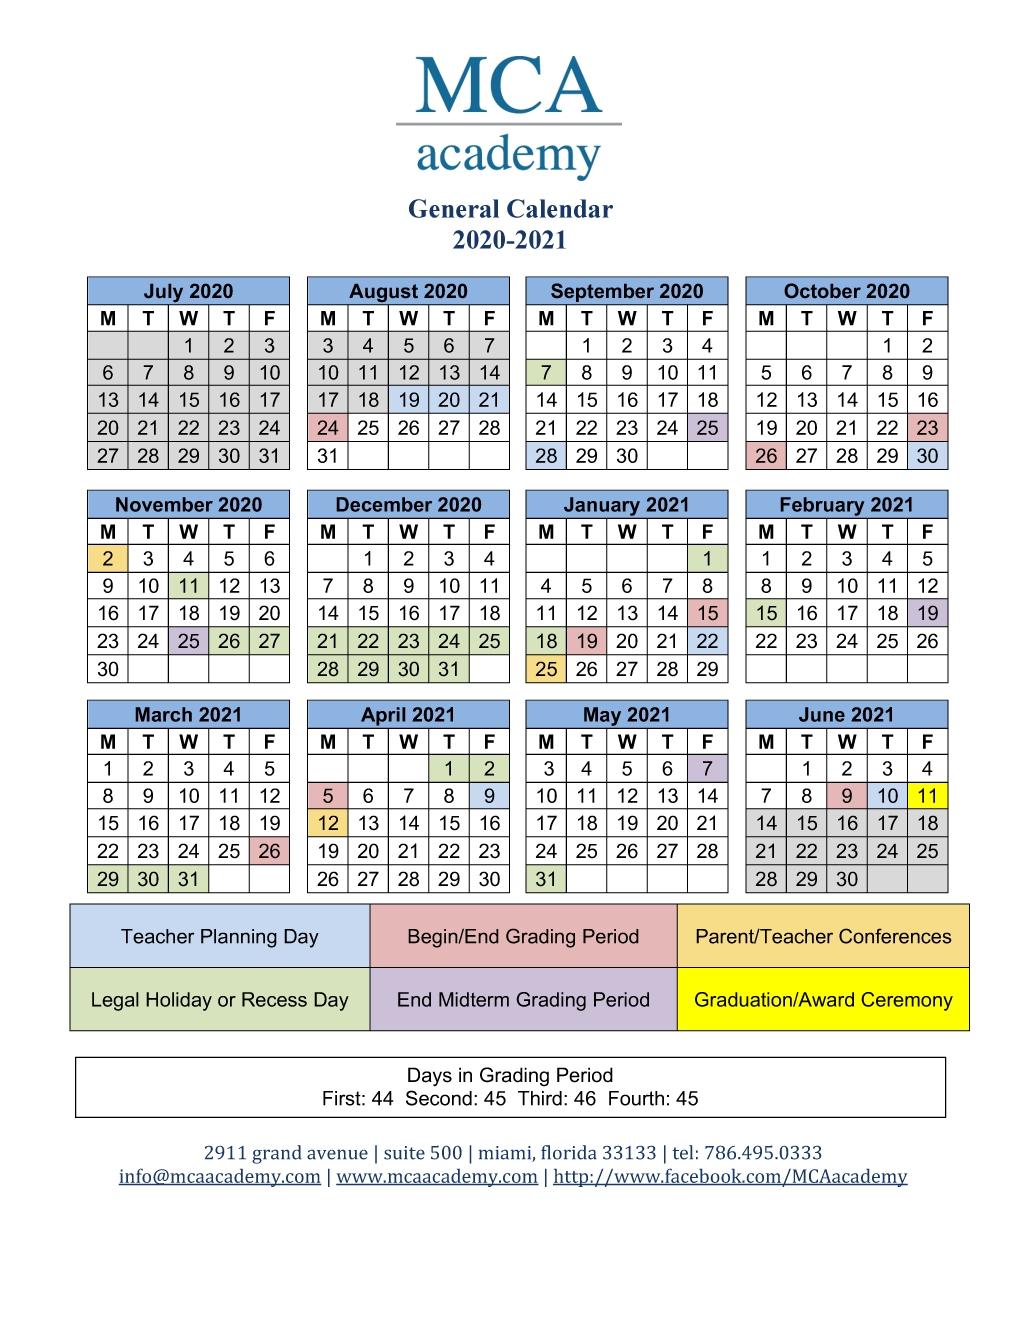 School Calendar 2020-2021 - Mca Academy